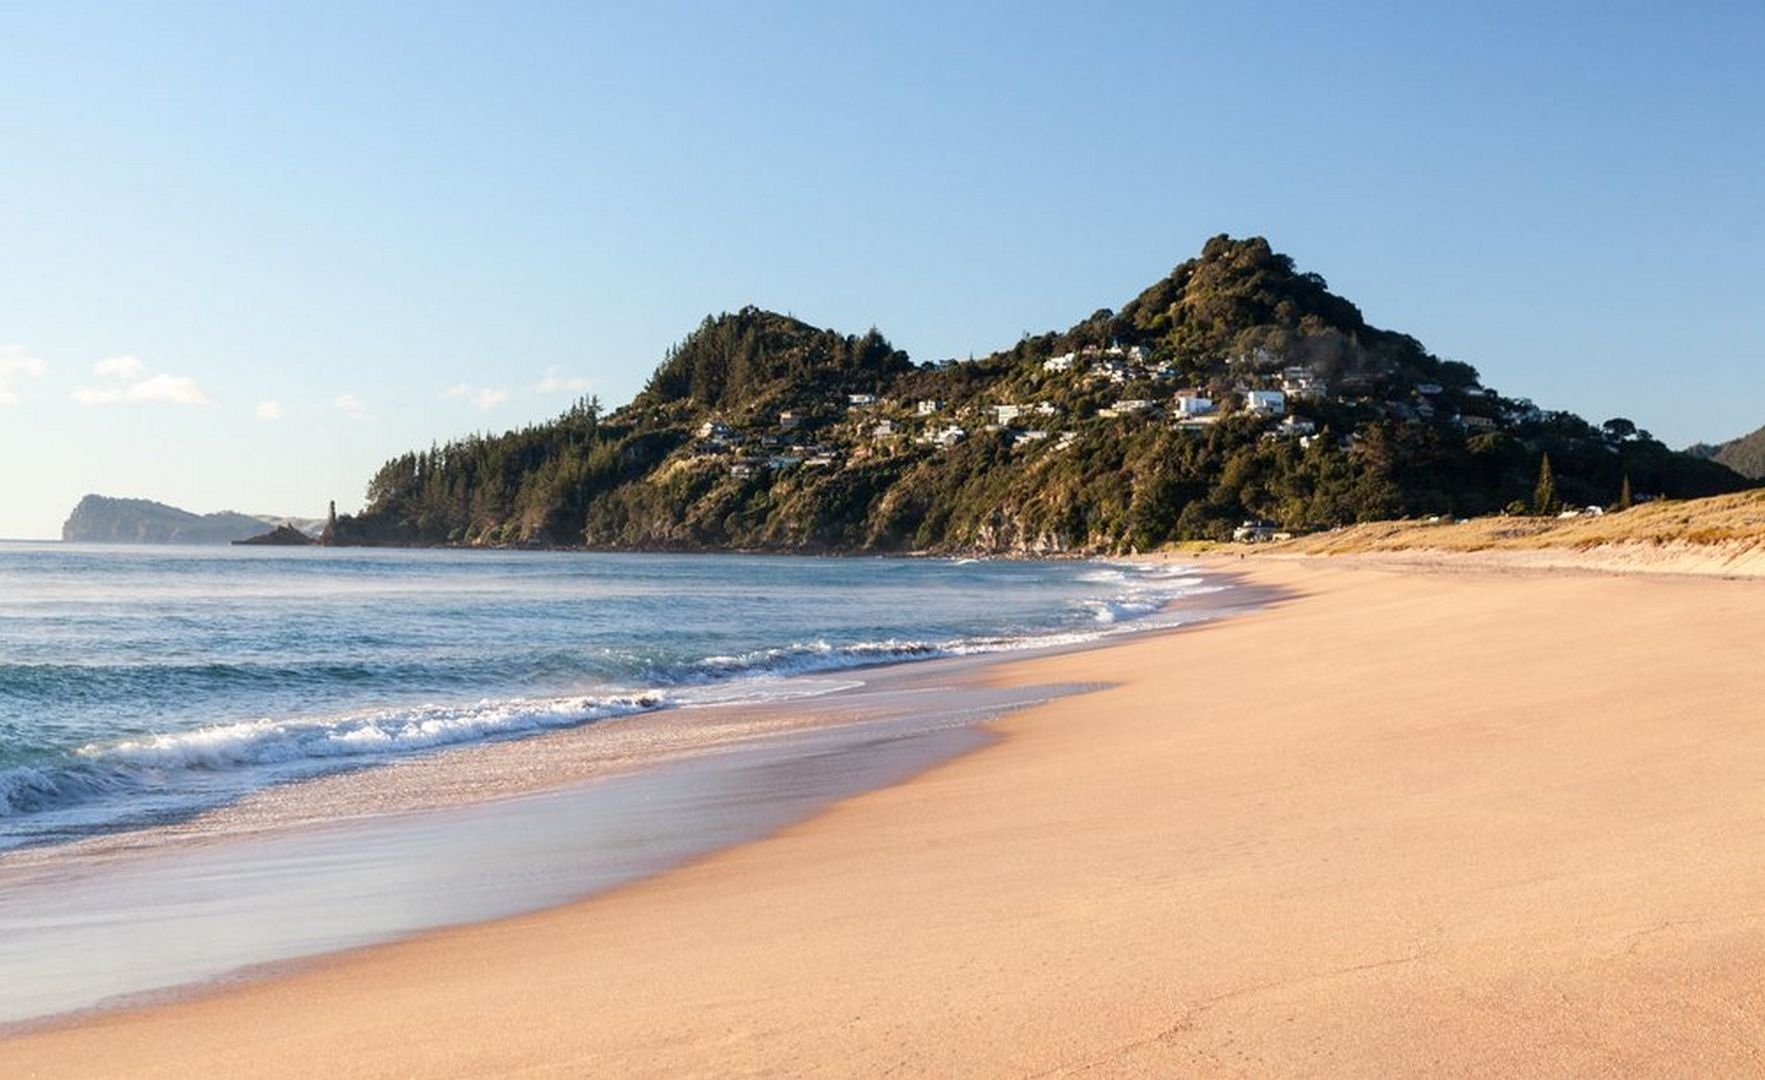 Tairua Ocean Beach